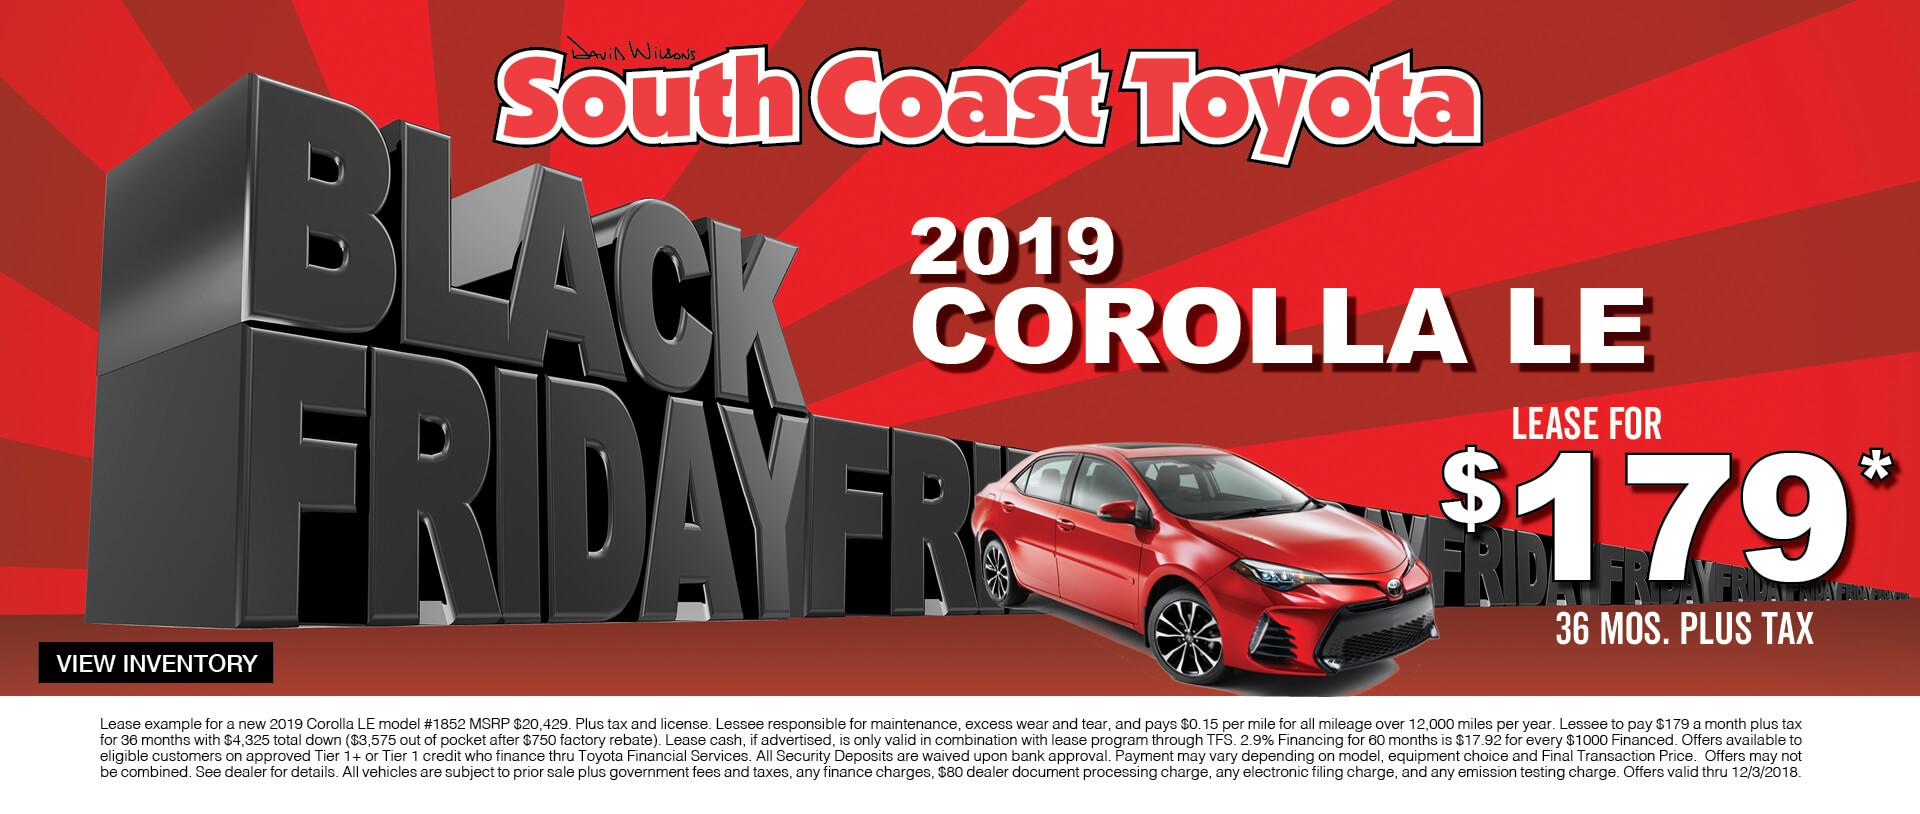 Toyota Corolla $179 Lease